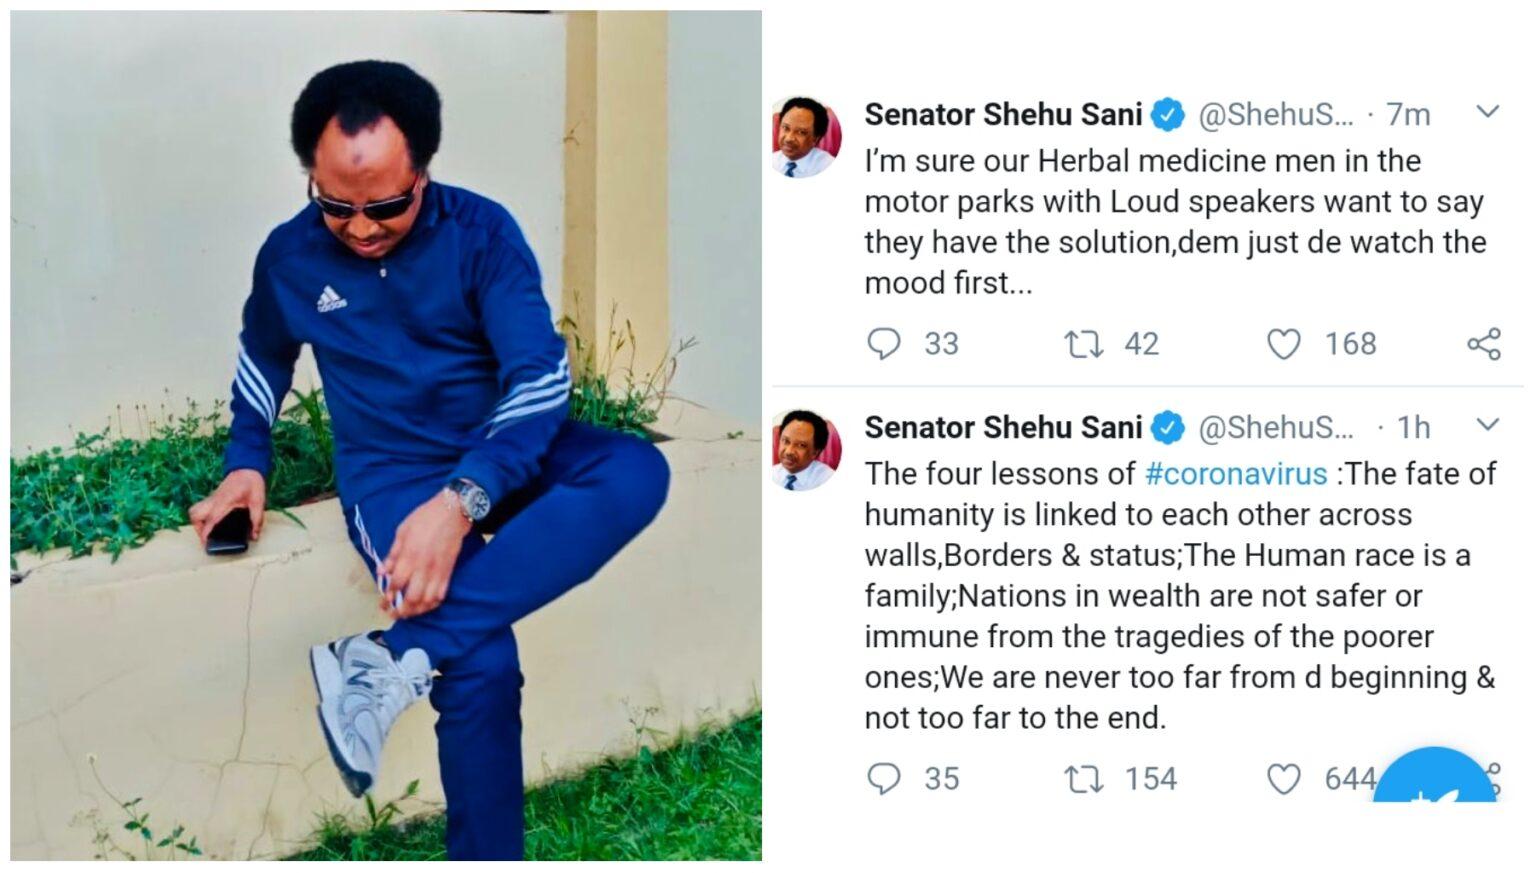 The former senator's post